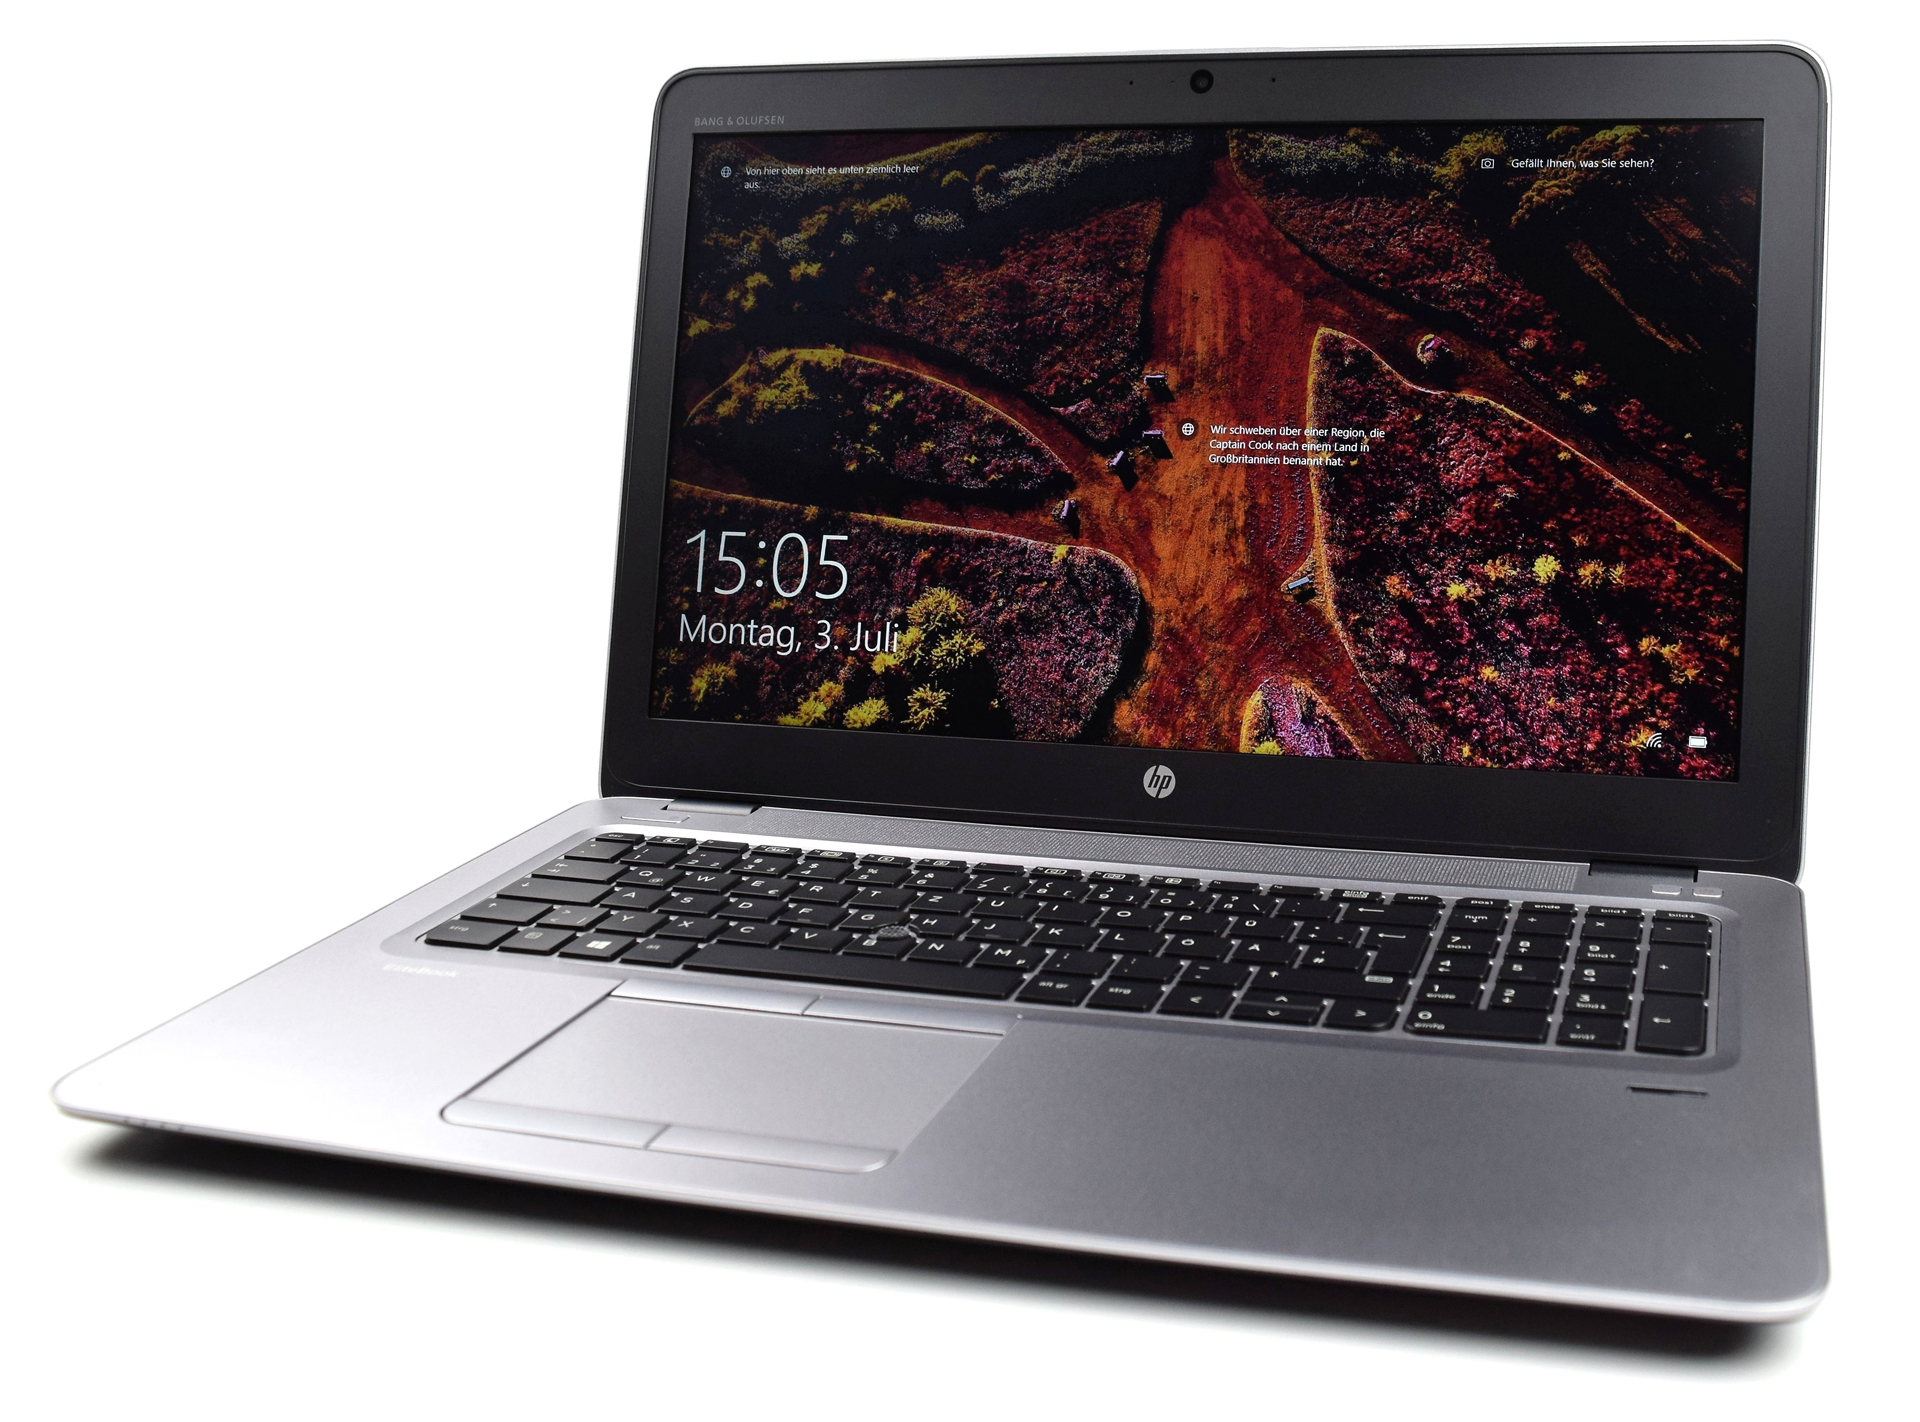 HP EliteBook 745 G2 Huawei Modem Windows Vista 64-BIT